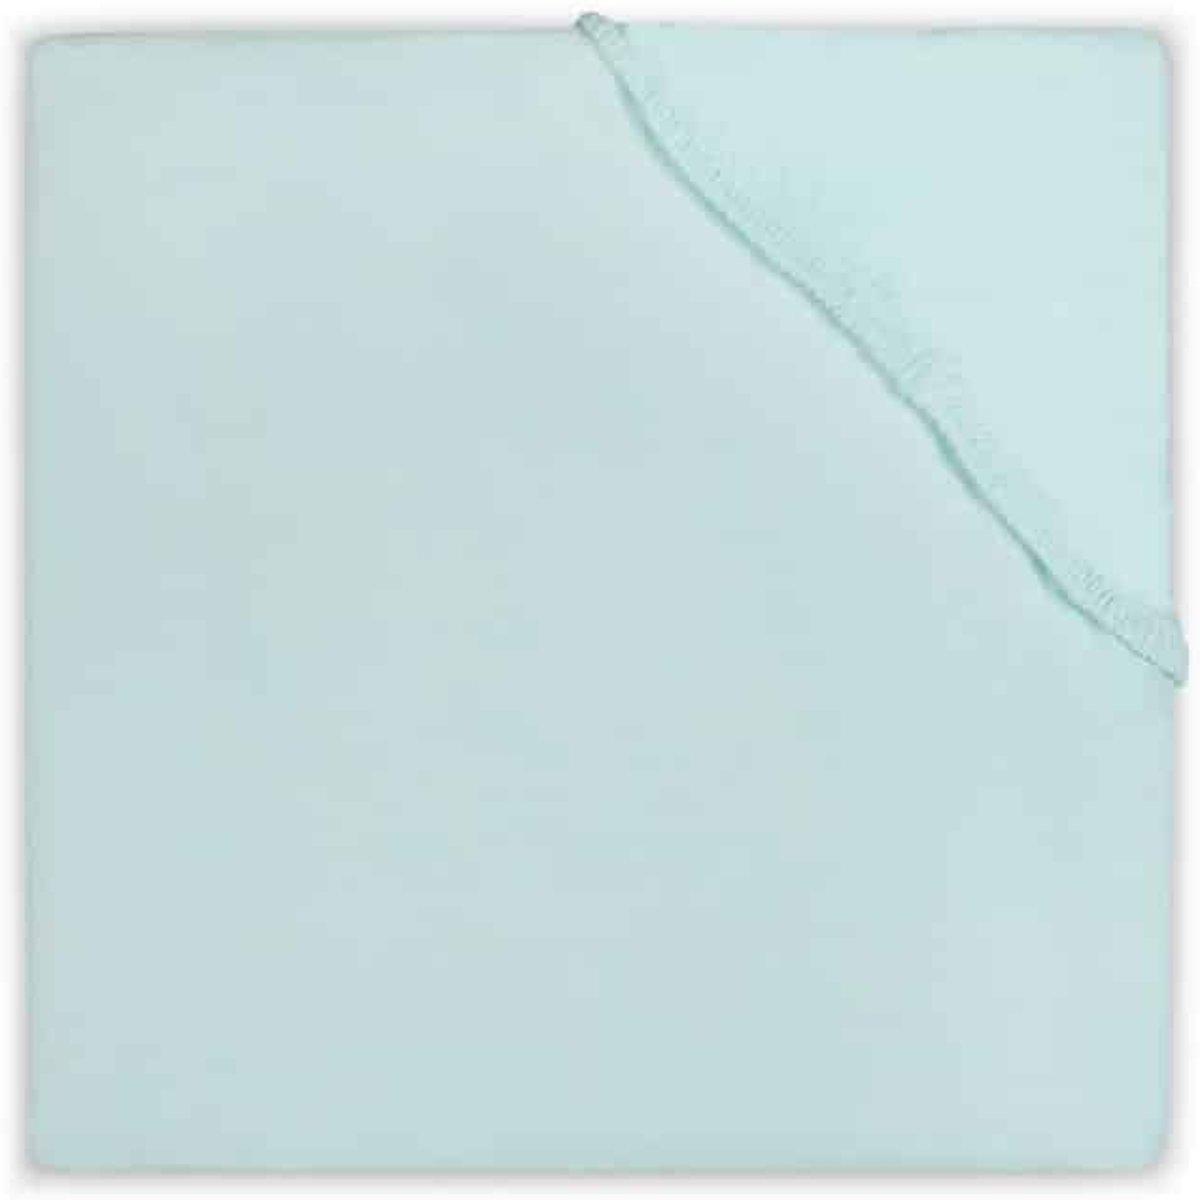 Jollein - Ledikant Hoeslaken Jersey 60x120 cm - Jade